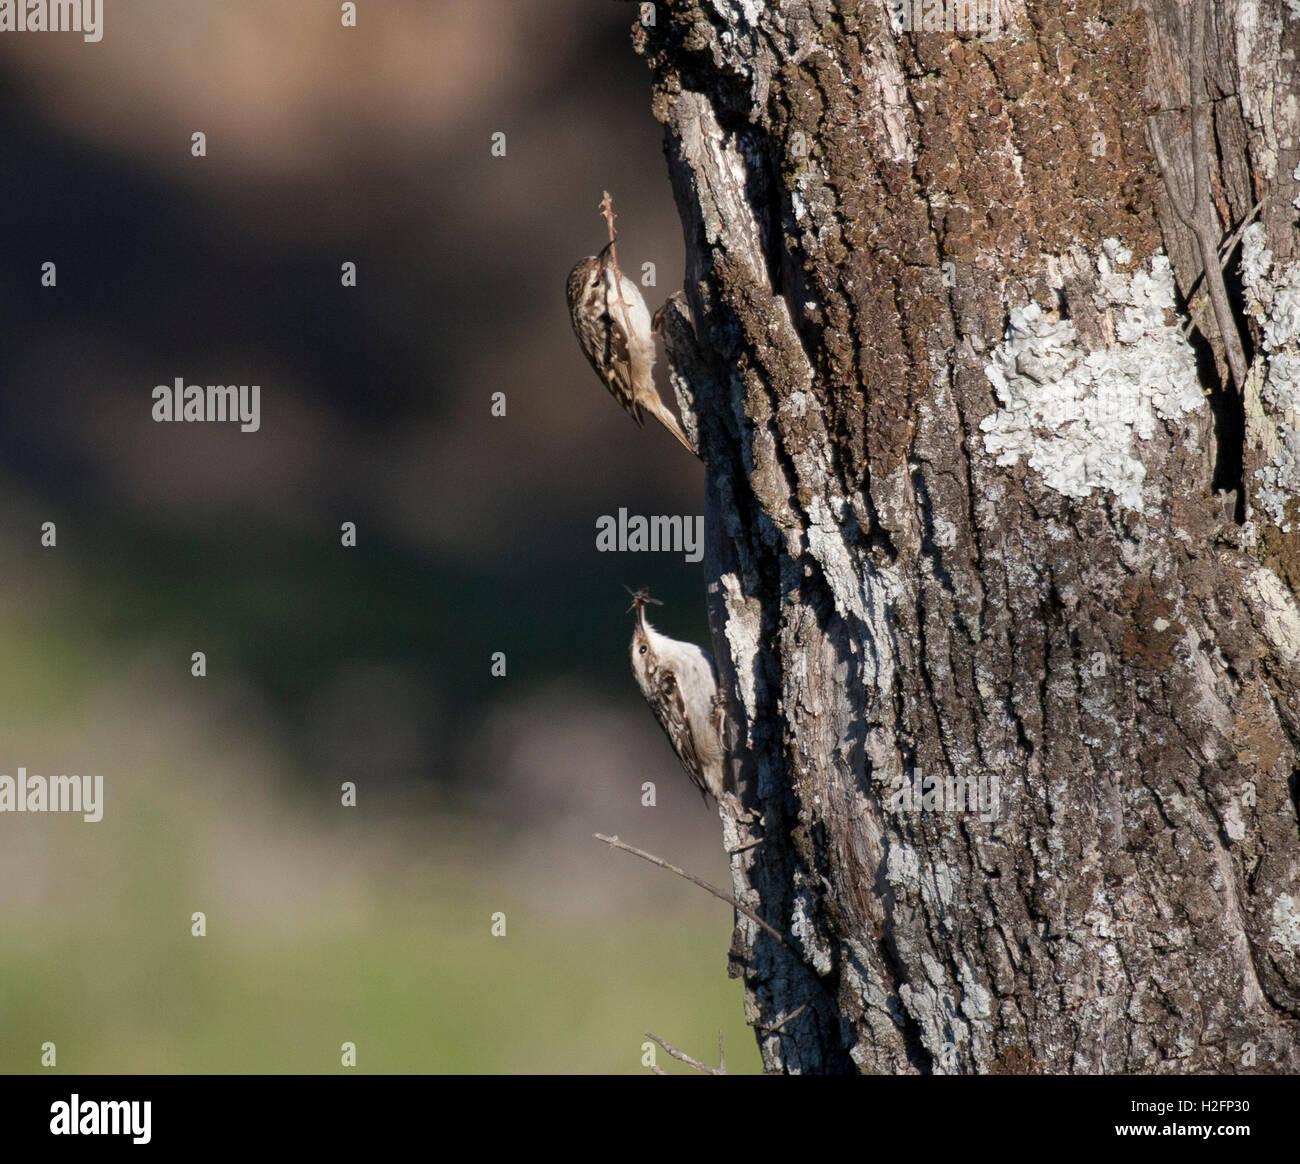 Short-toed Treecreeper pair (Certhia brachydactyla), Spain on Olive tree - Stock Image